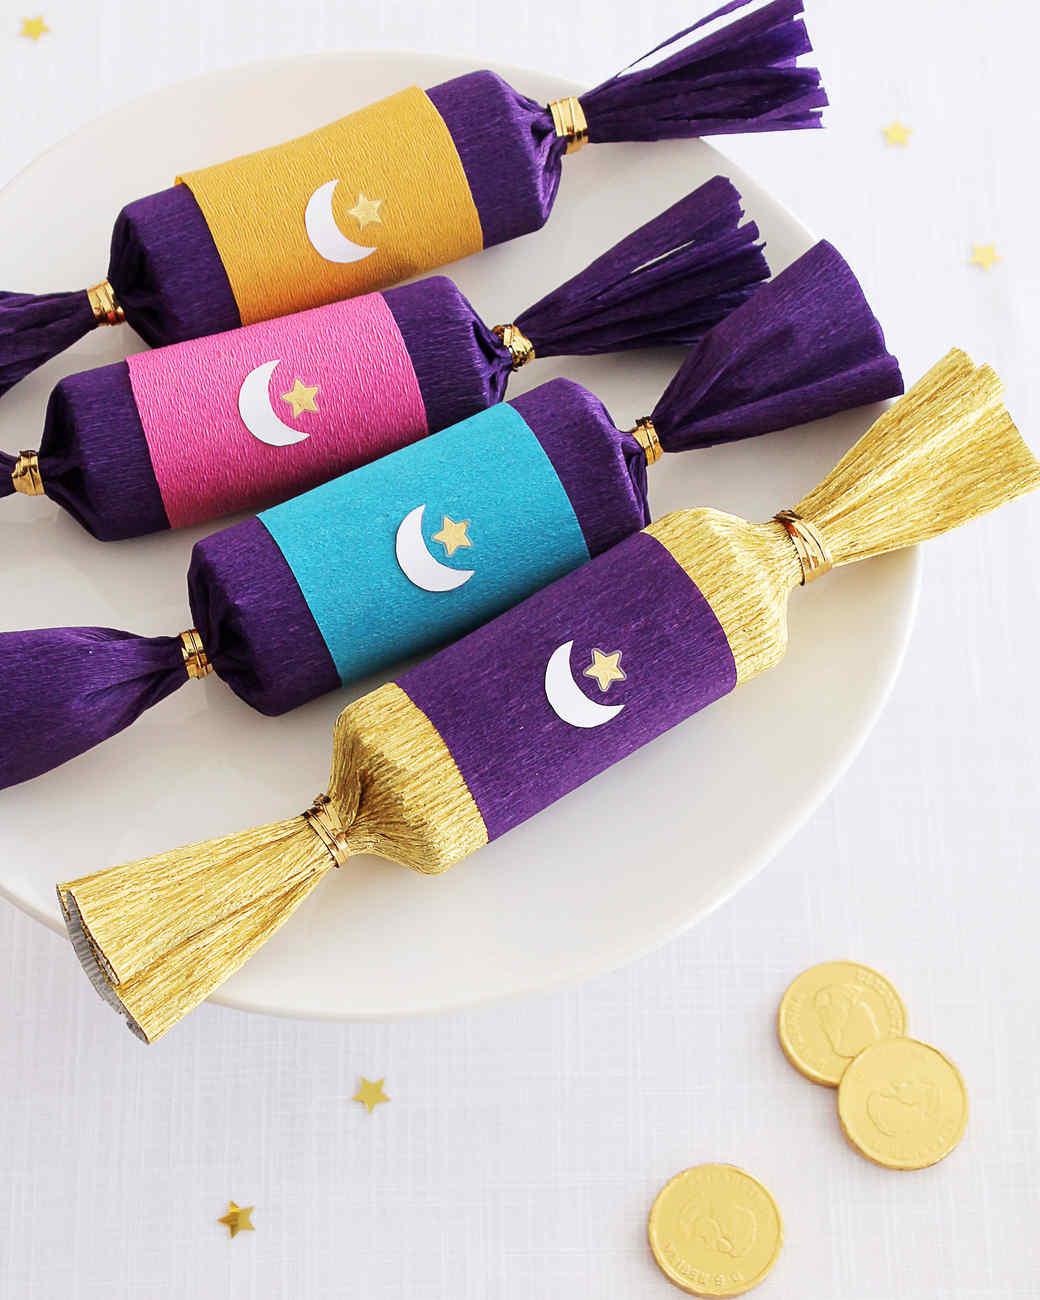 Popular Islam Eid Al-Fitr Feast - eid-al-fitr-party-crackers_vert  Graphic_749590 .jpg?itok\u003dy8-vjOnd